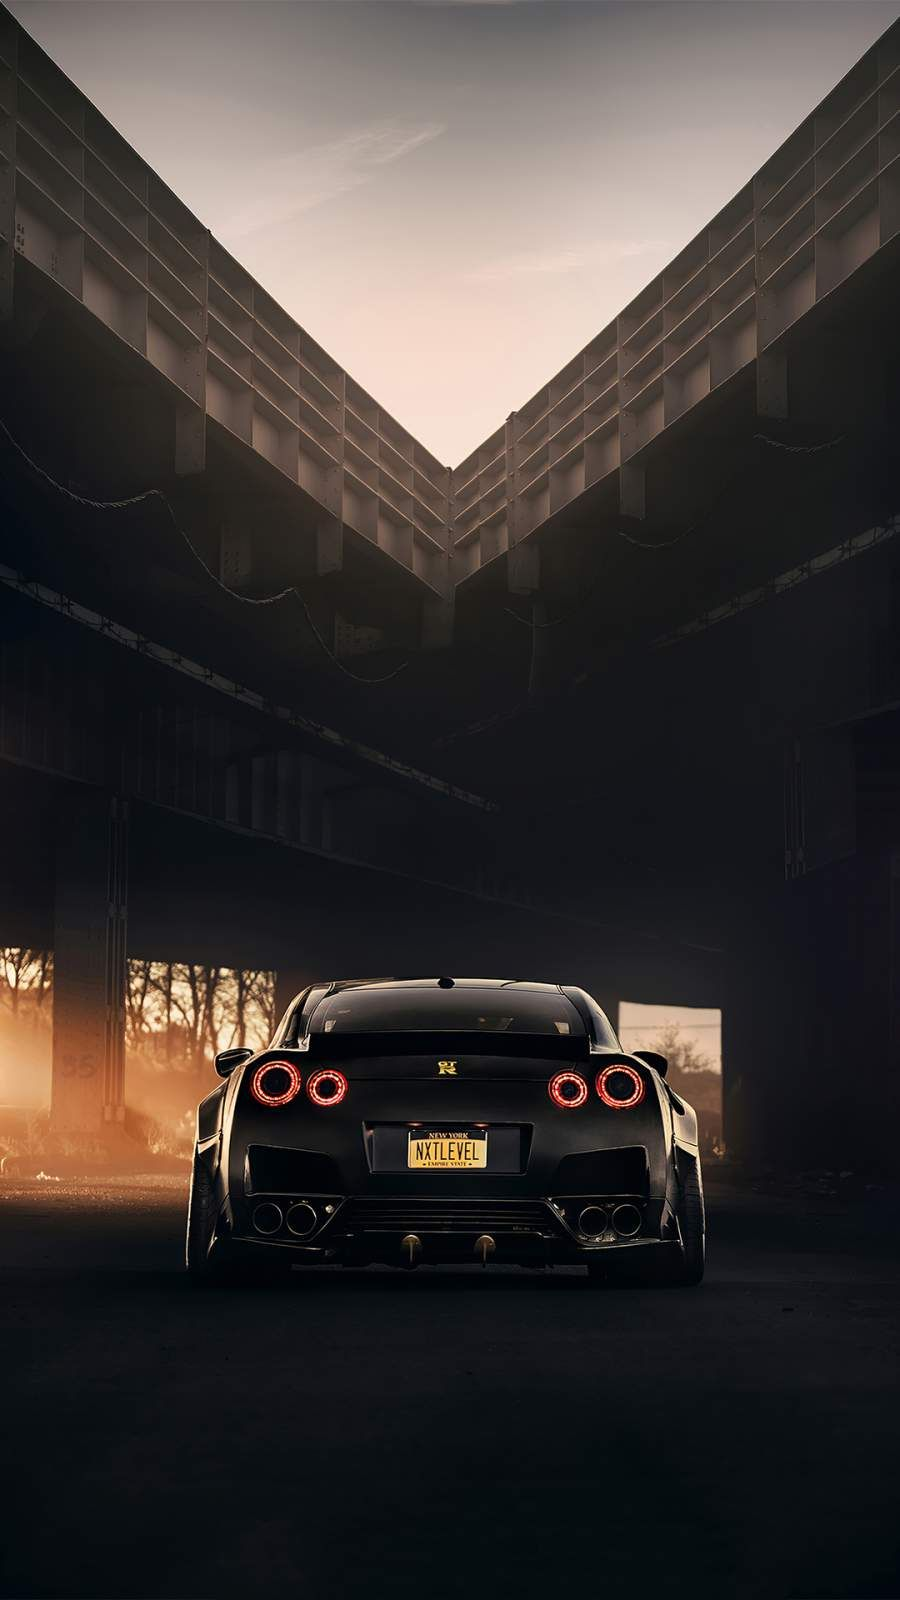 Nissan Gtr Black Iphone Wallpaper Nissan Gtr Nissan Gtr Black Nissan Gtr Wallpapers